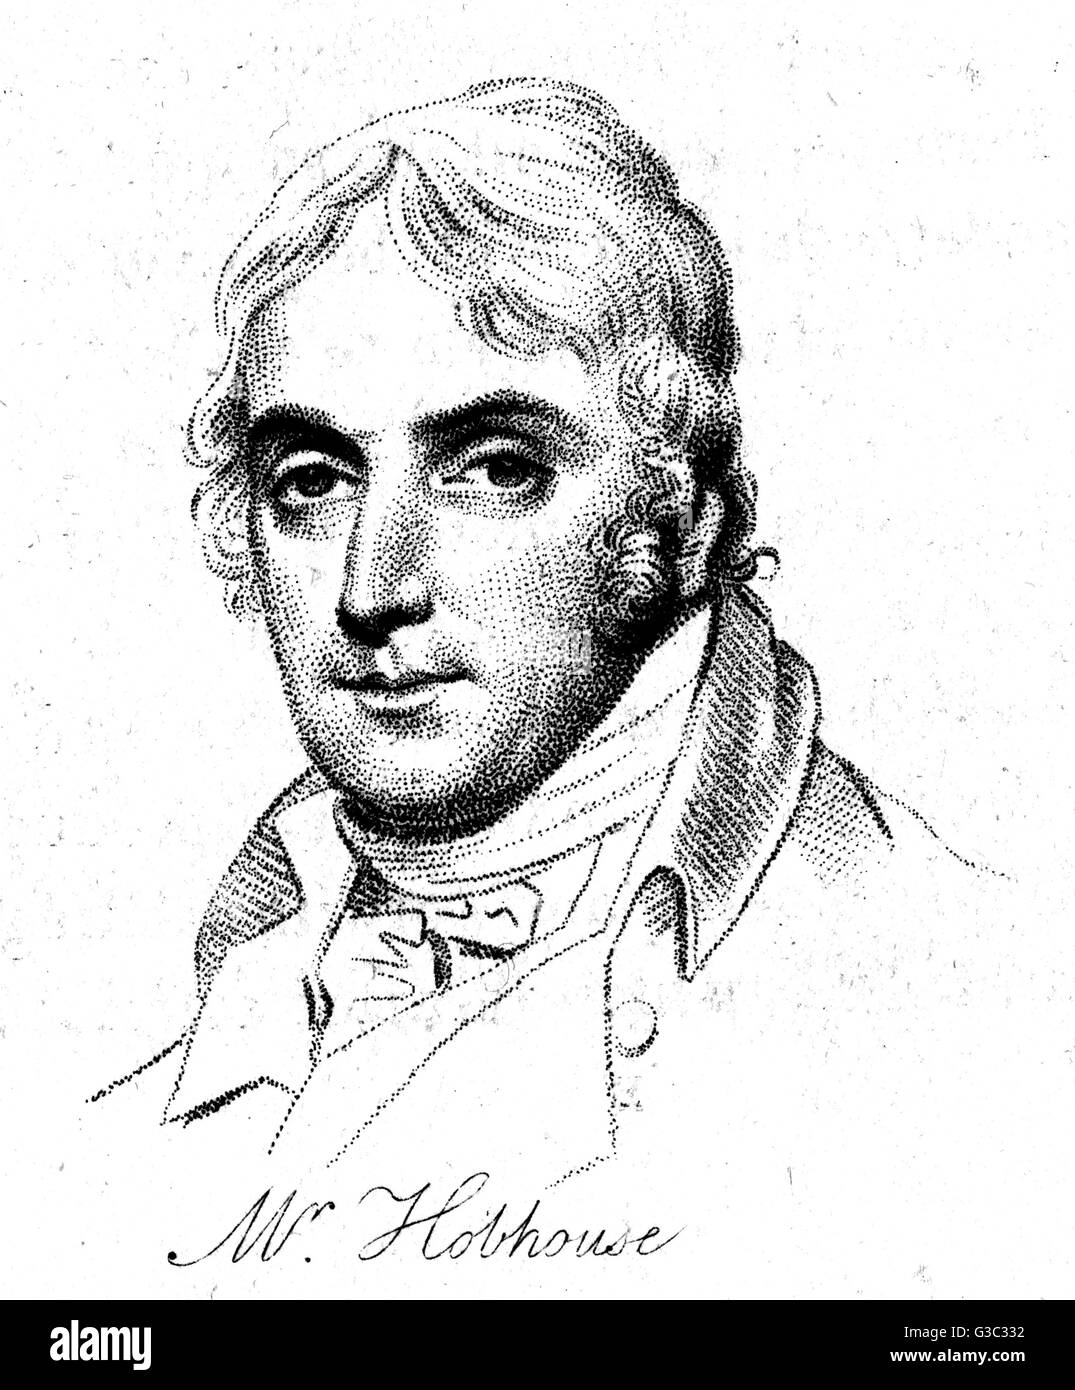 John Cam Hobhouse, 1st Baron Broughton (1786-1869), English radical politician and writer, Secretary of War (1832 - Stock Image